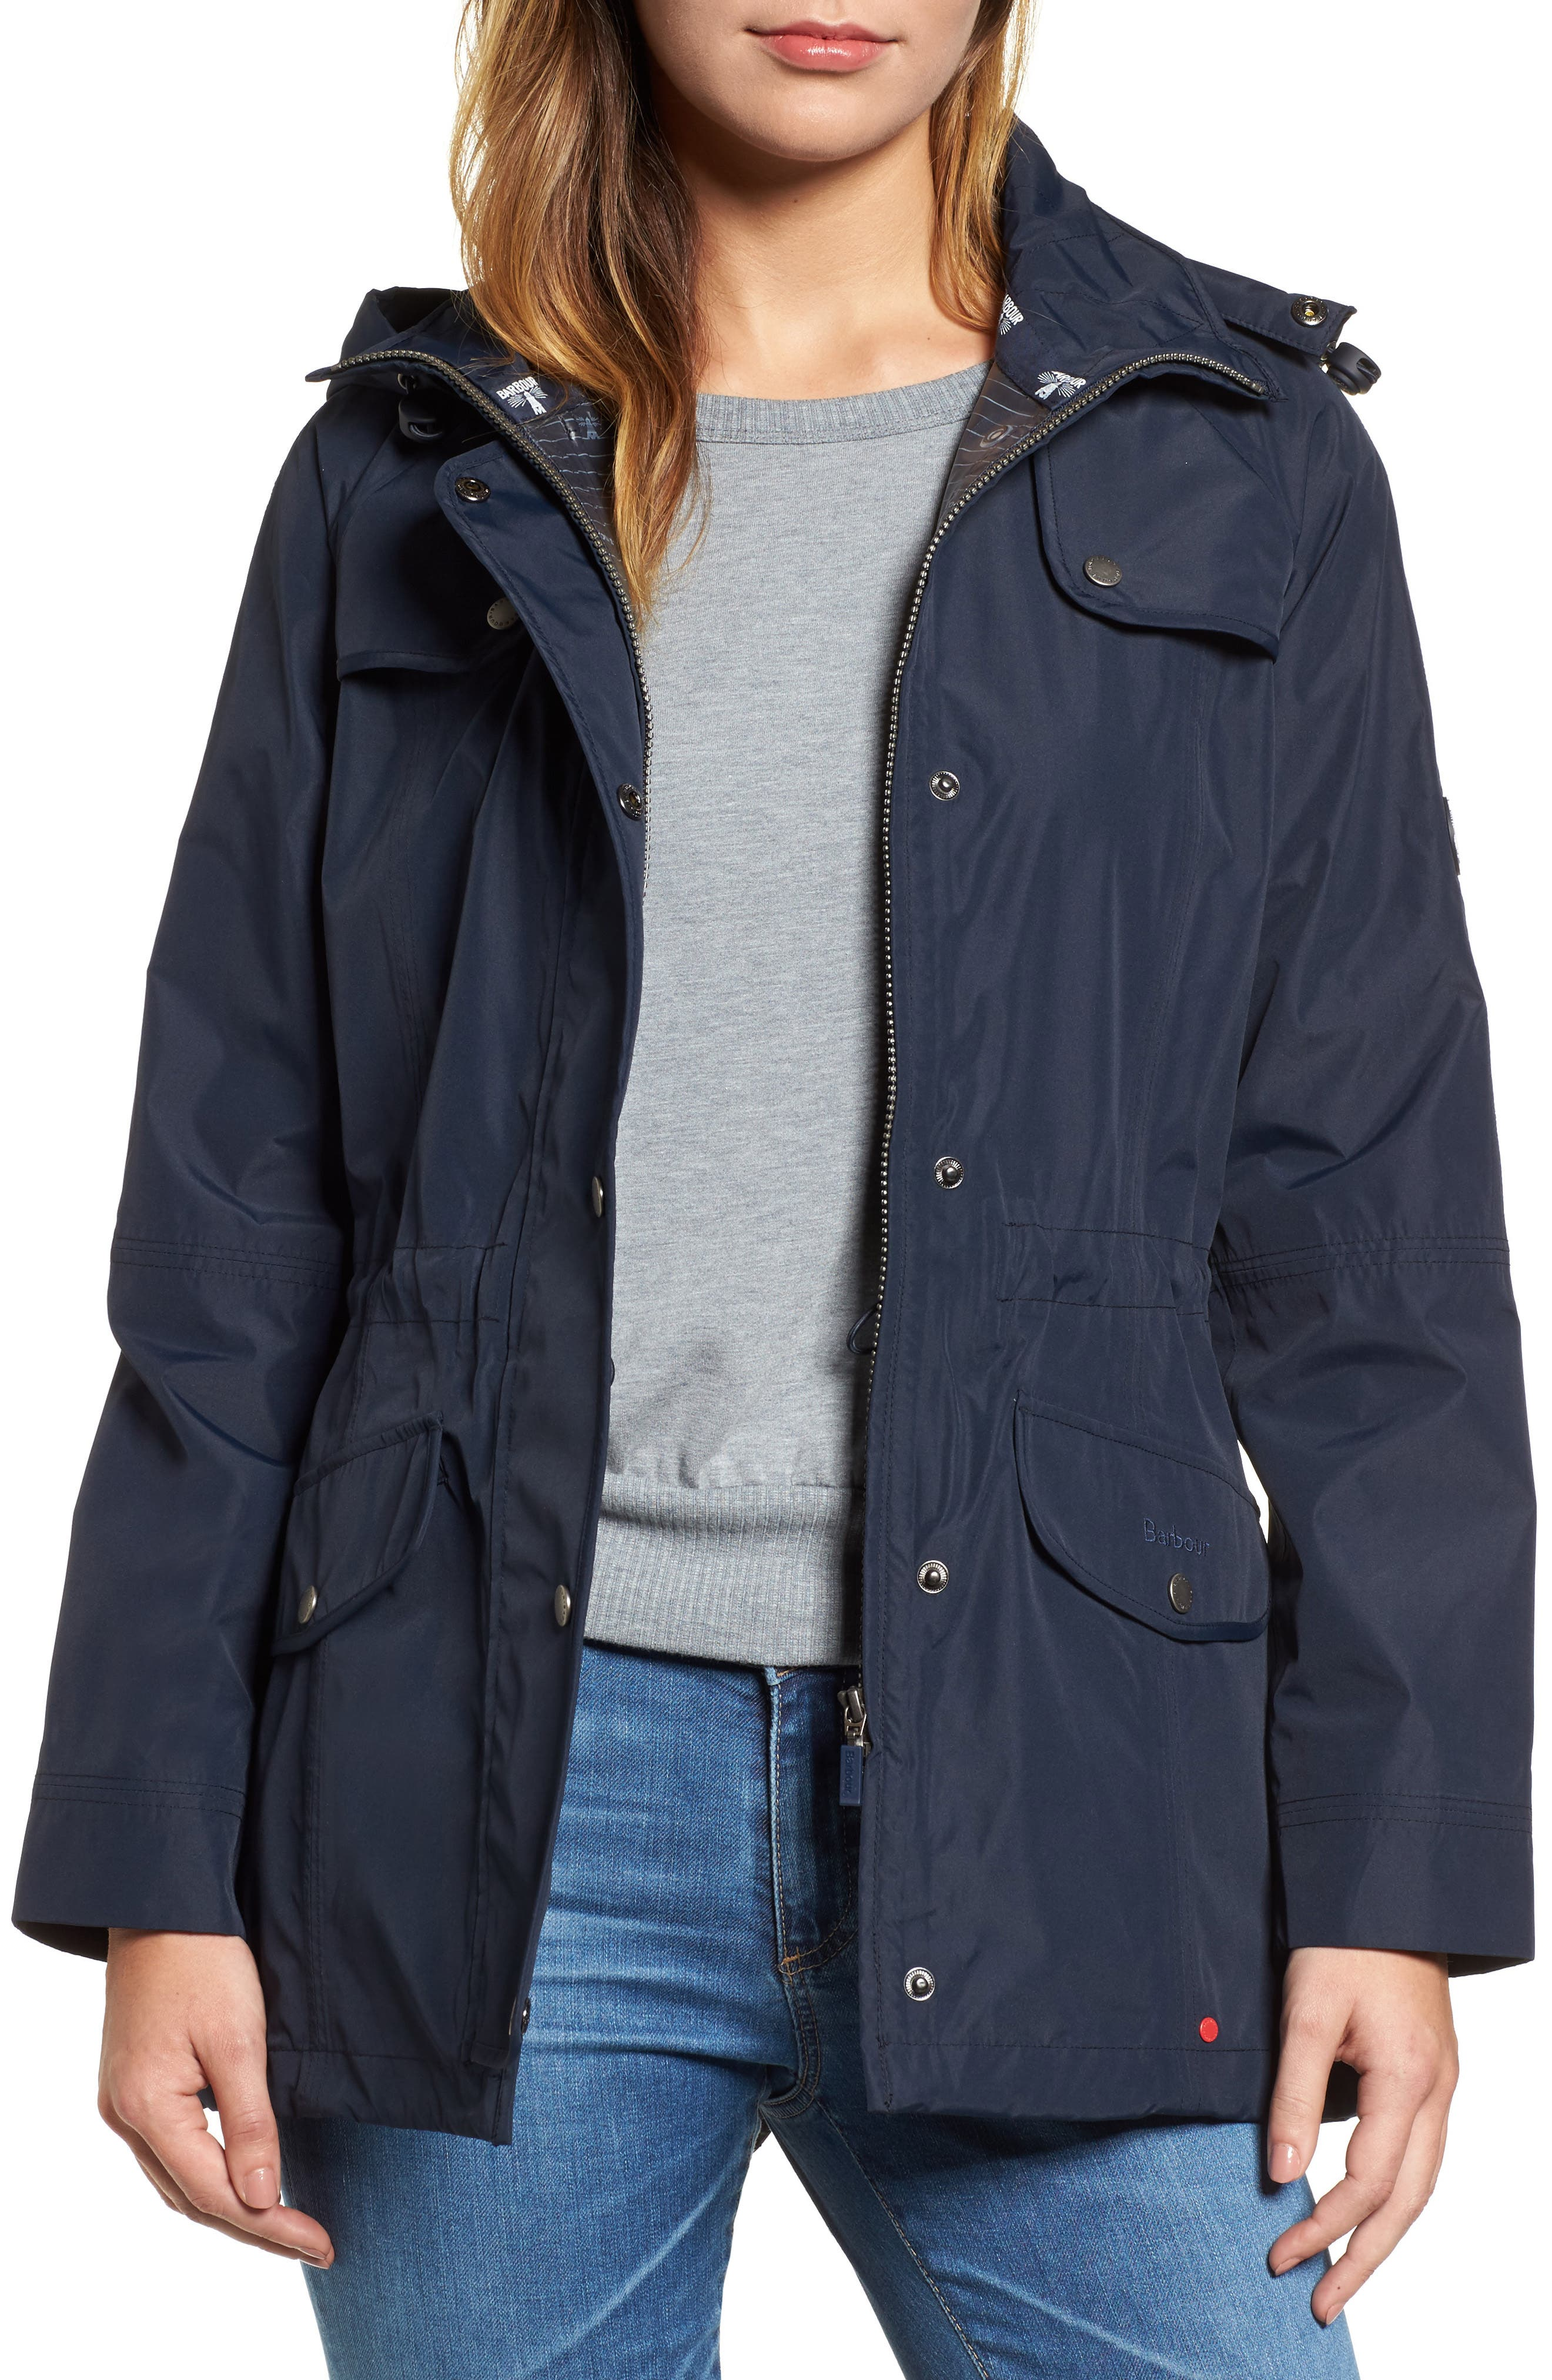 Trevose Hooded Jacket,                             Main thumbnail 1, color,                             Navy